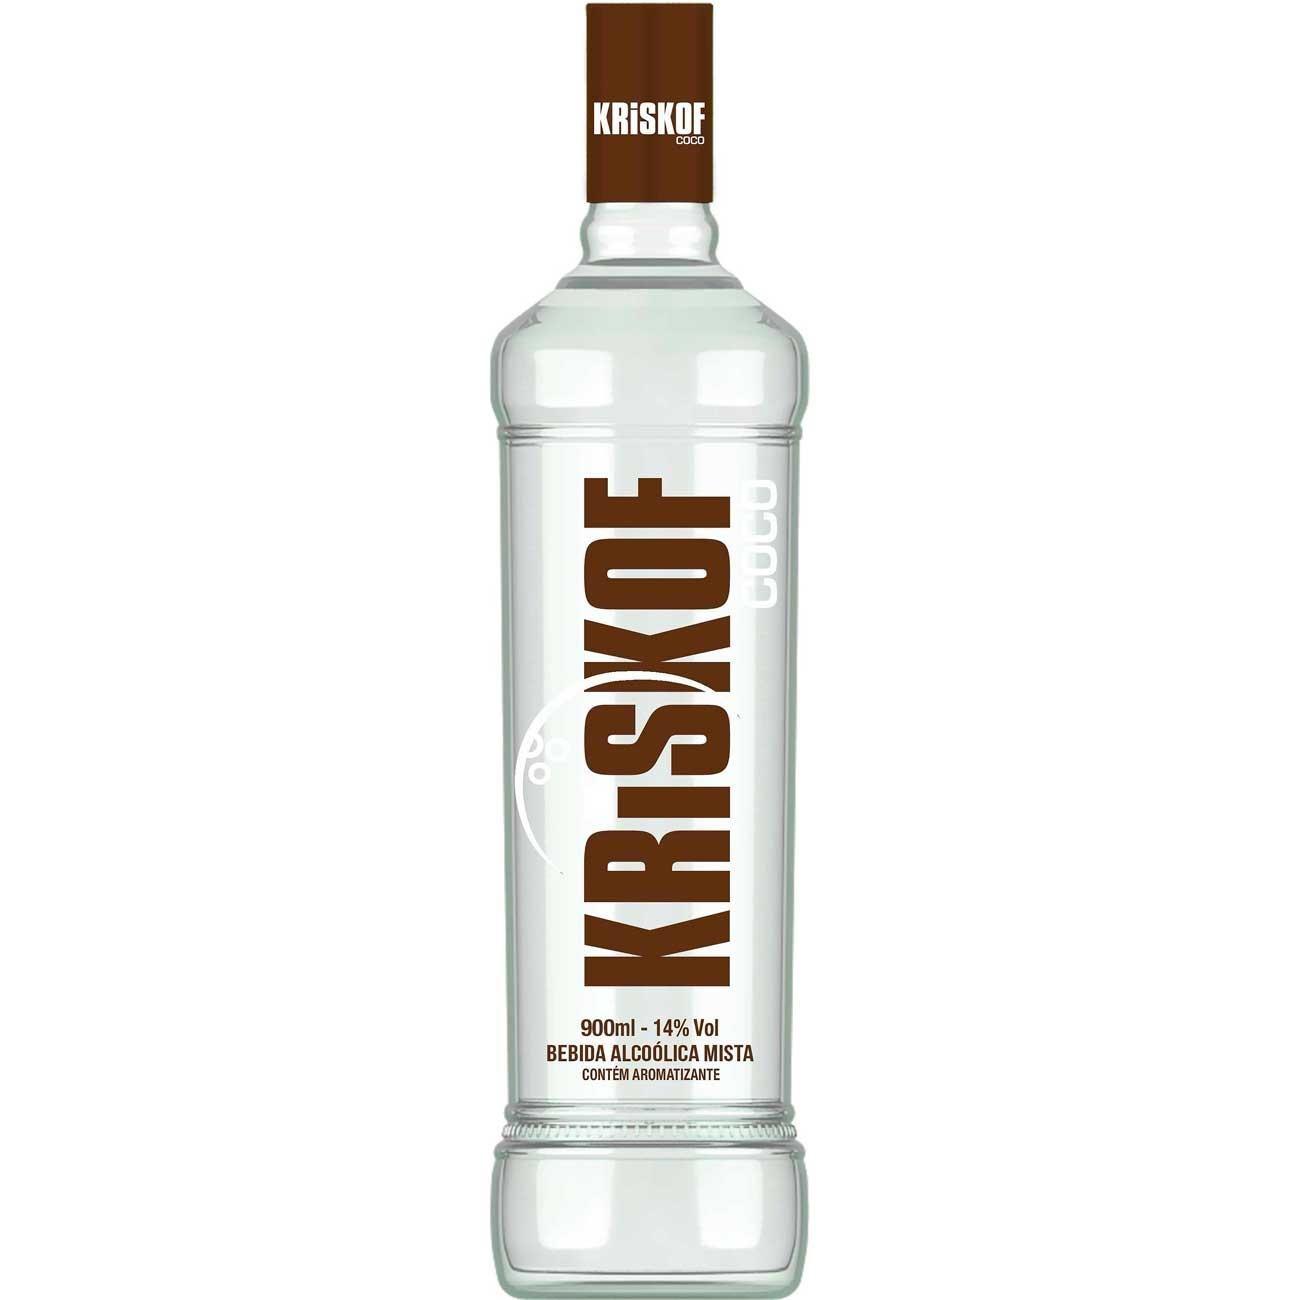 Vodka Kriskof Coco 900ml   Caixa com 6 unidades